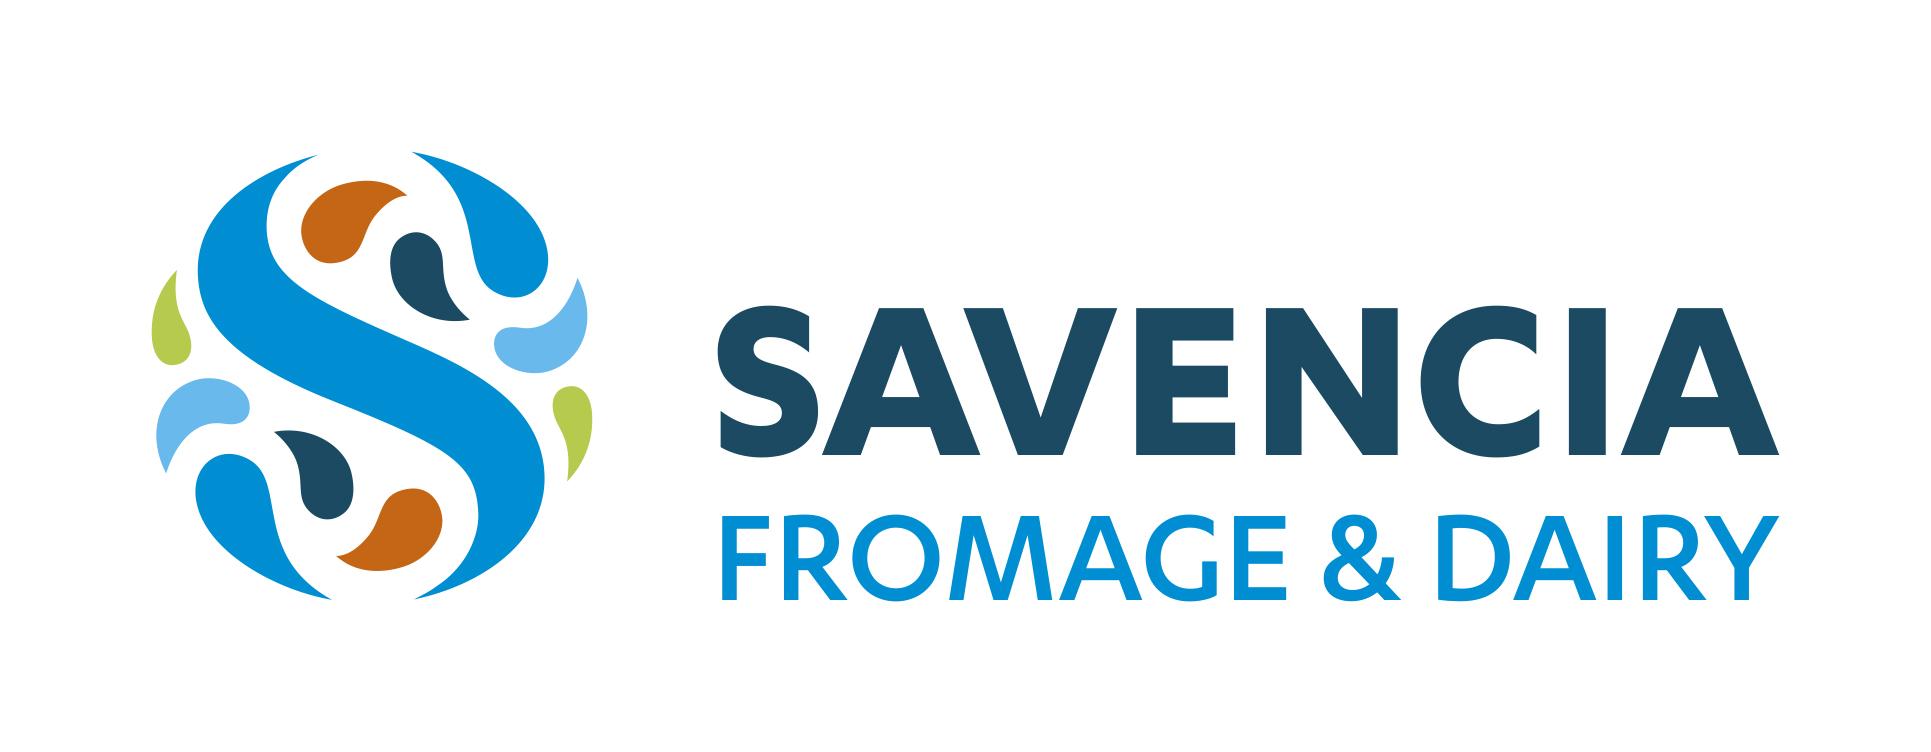 http:// - logo